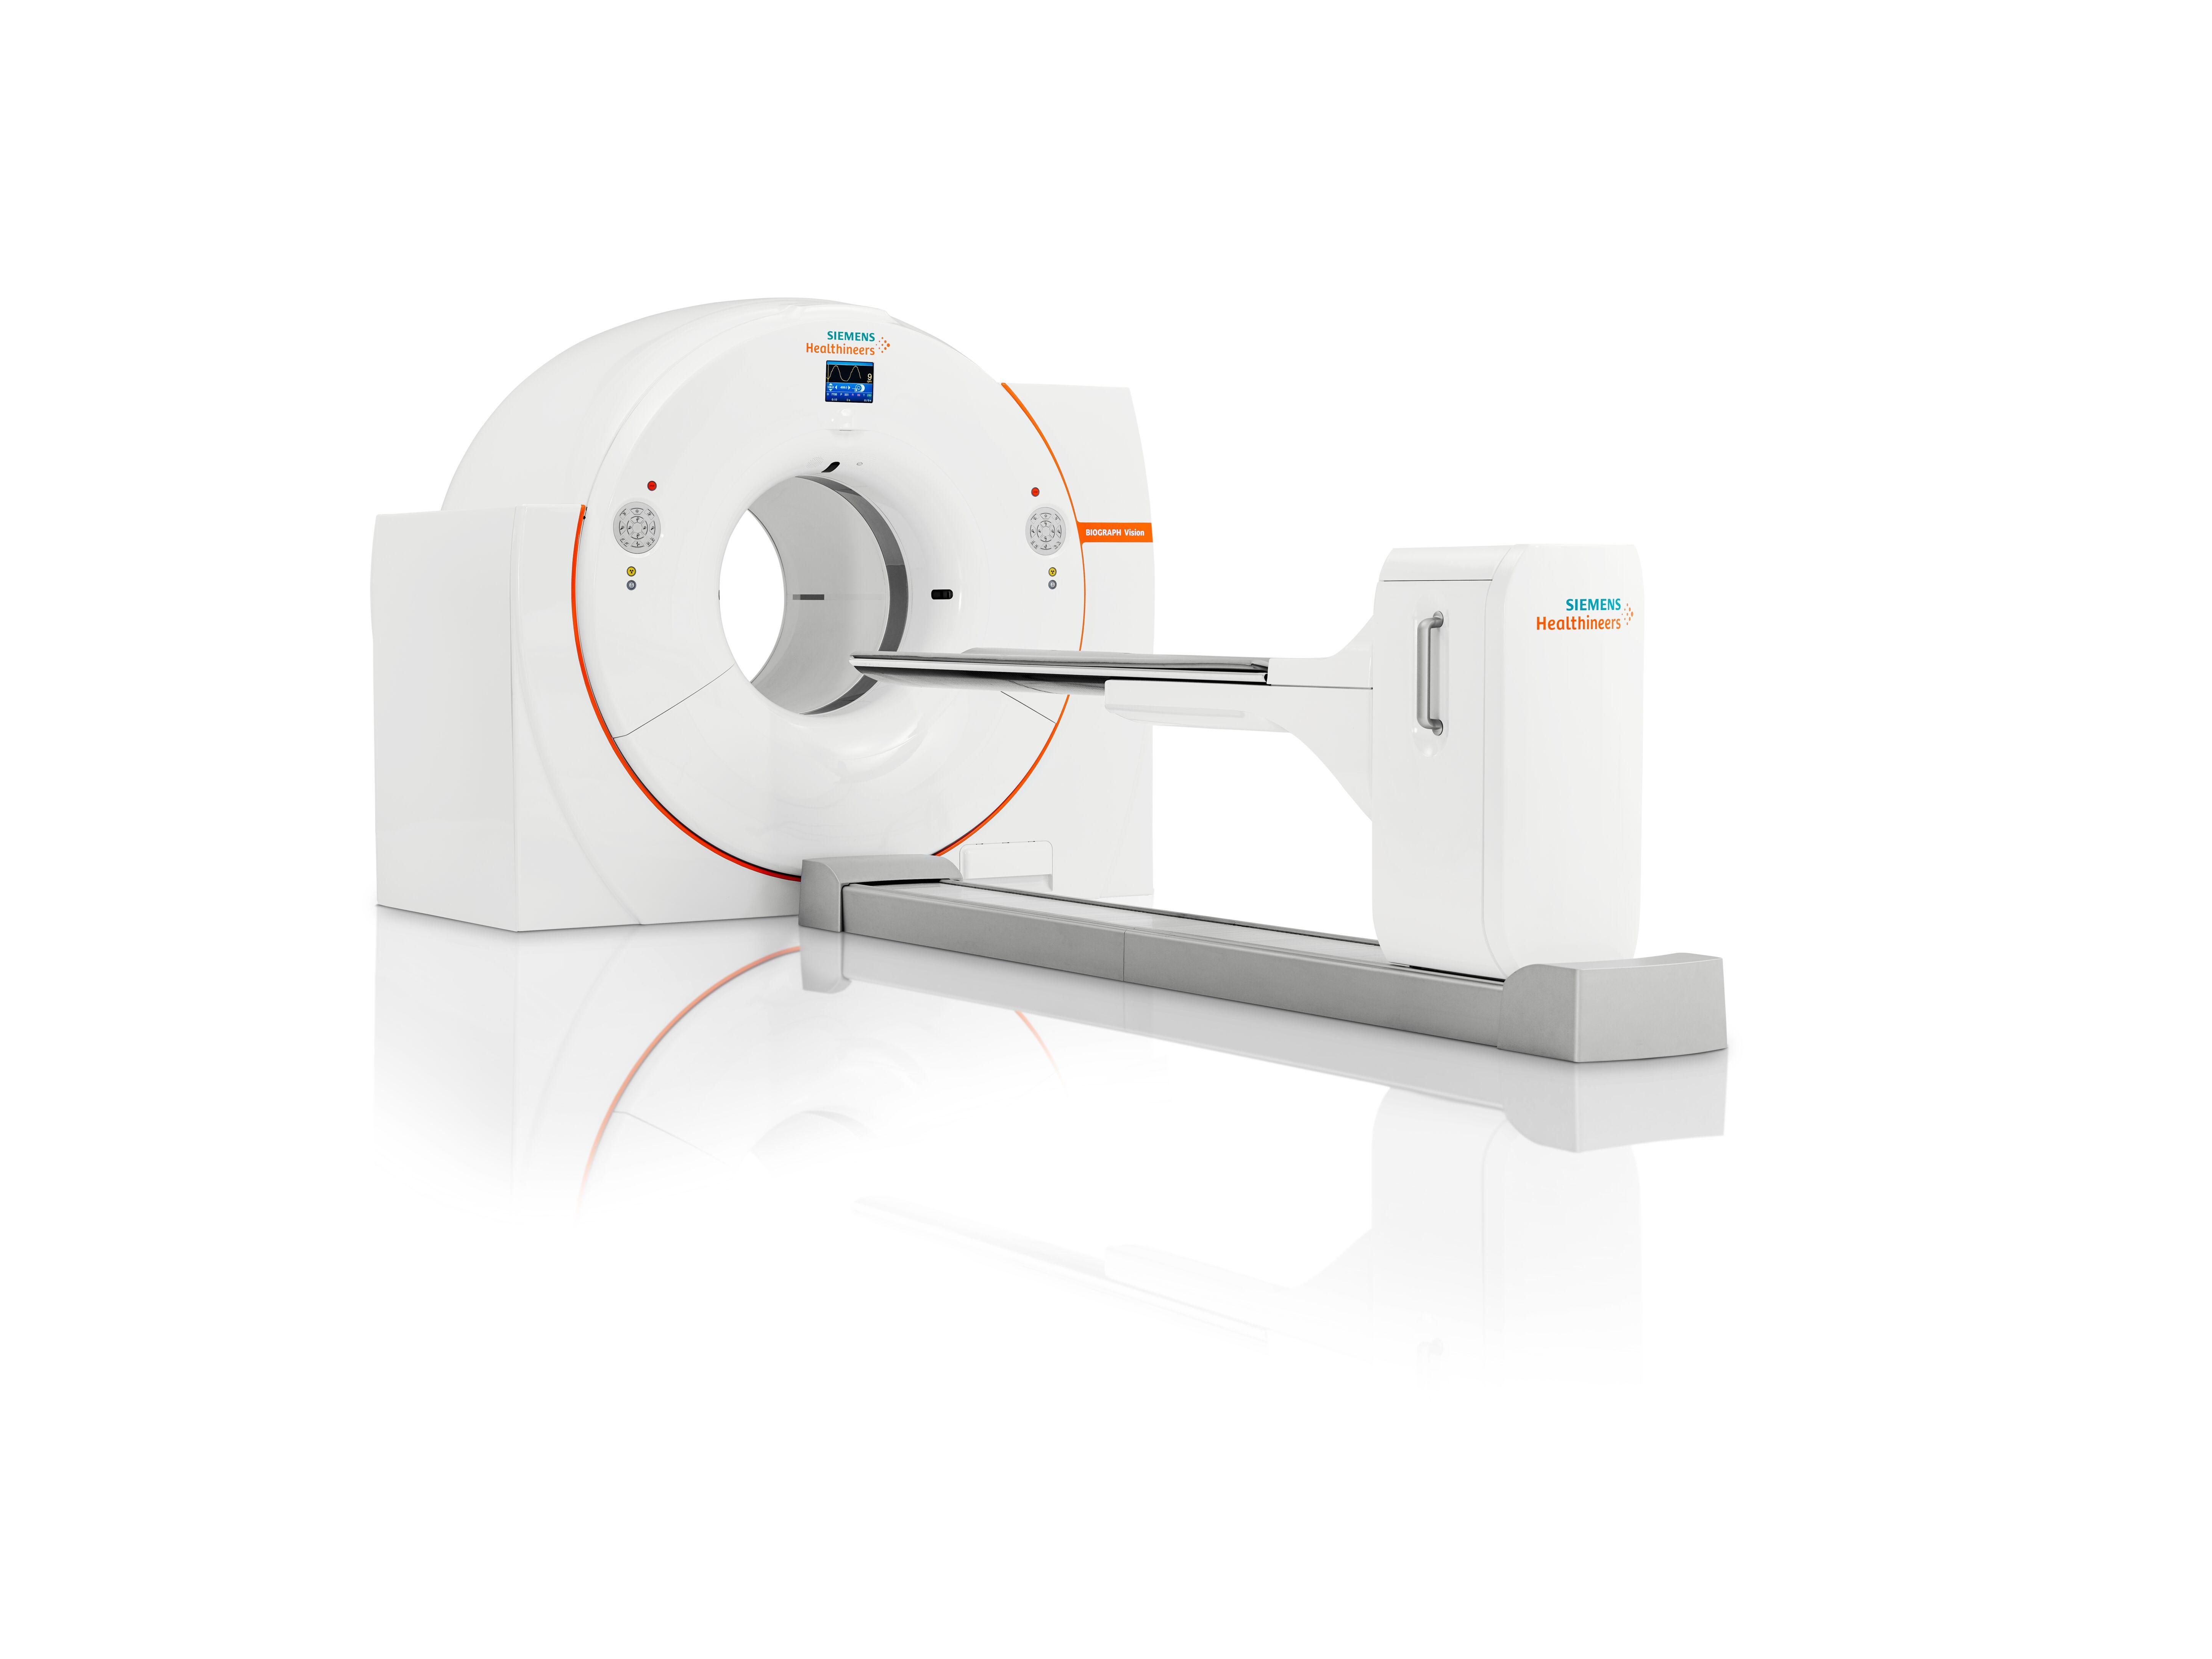 Biograph Vision 正电子发射及X射线计算机断层成像系统PET/CT